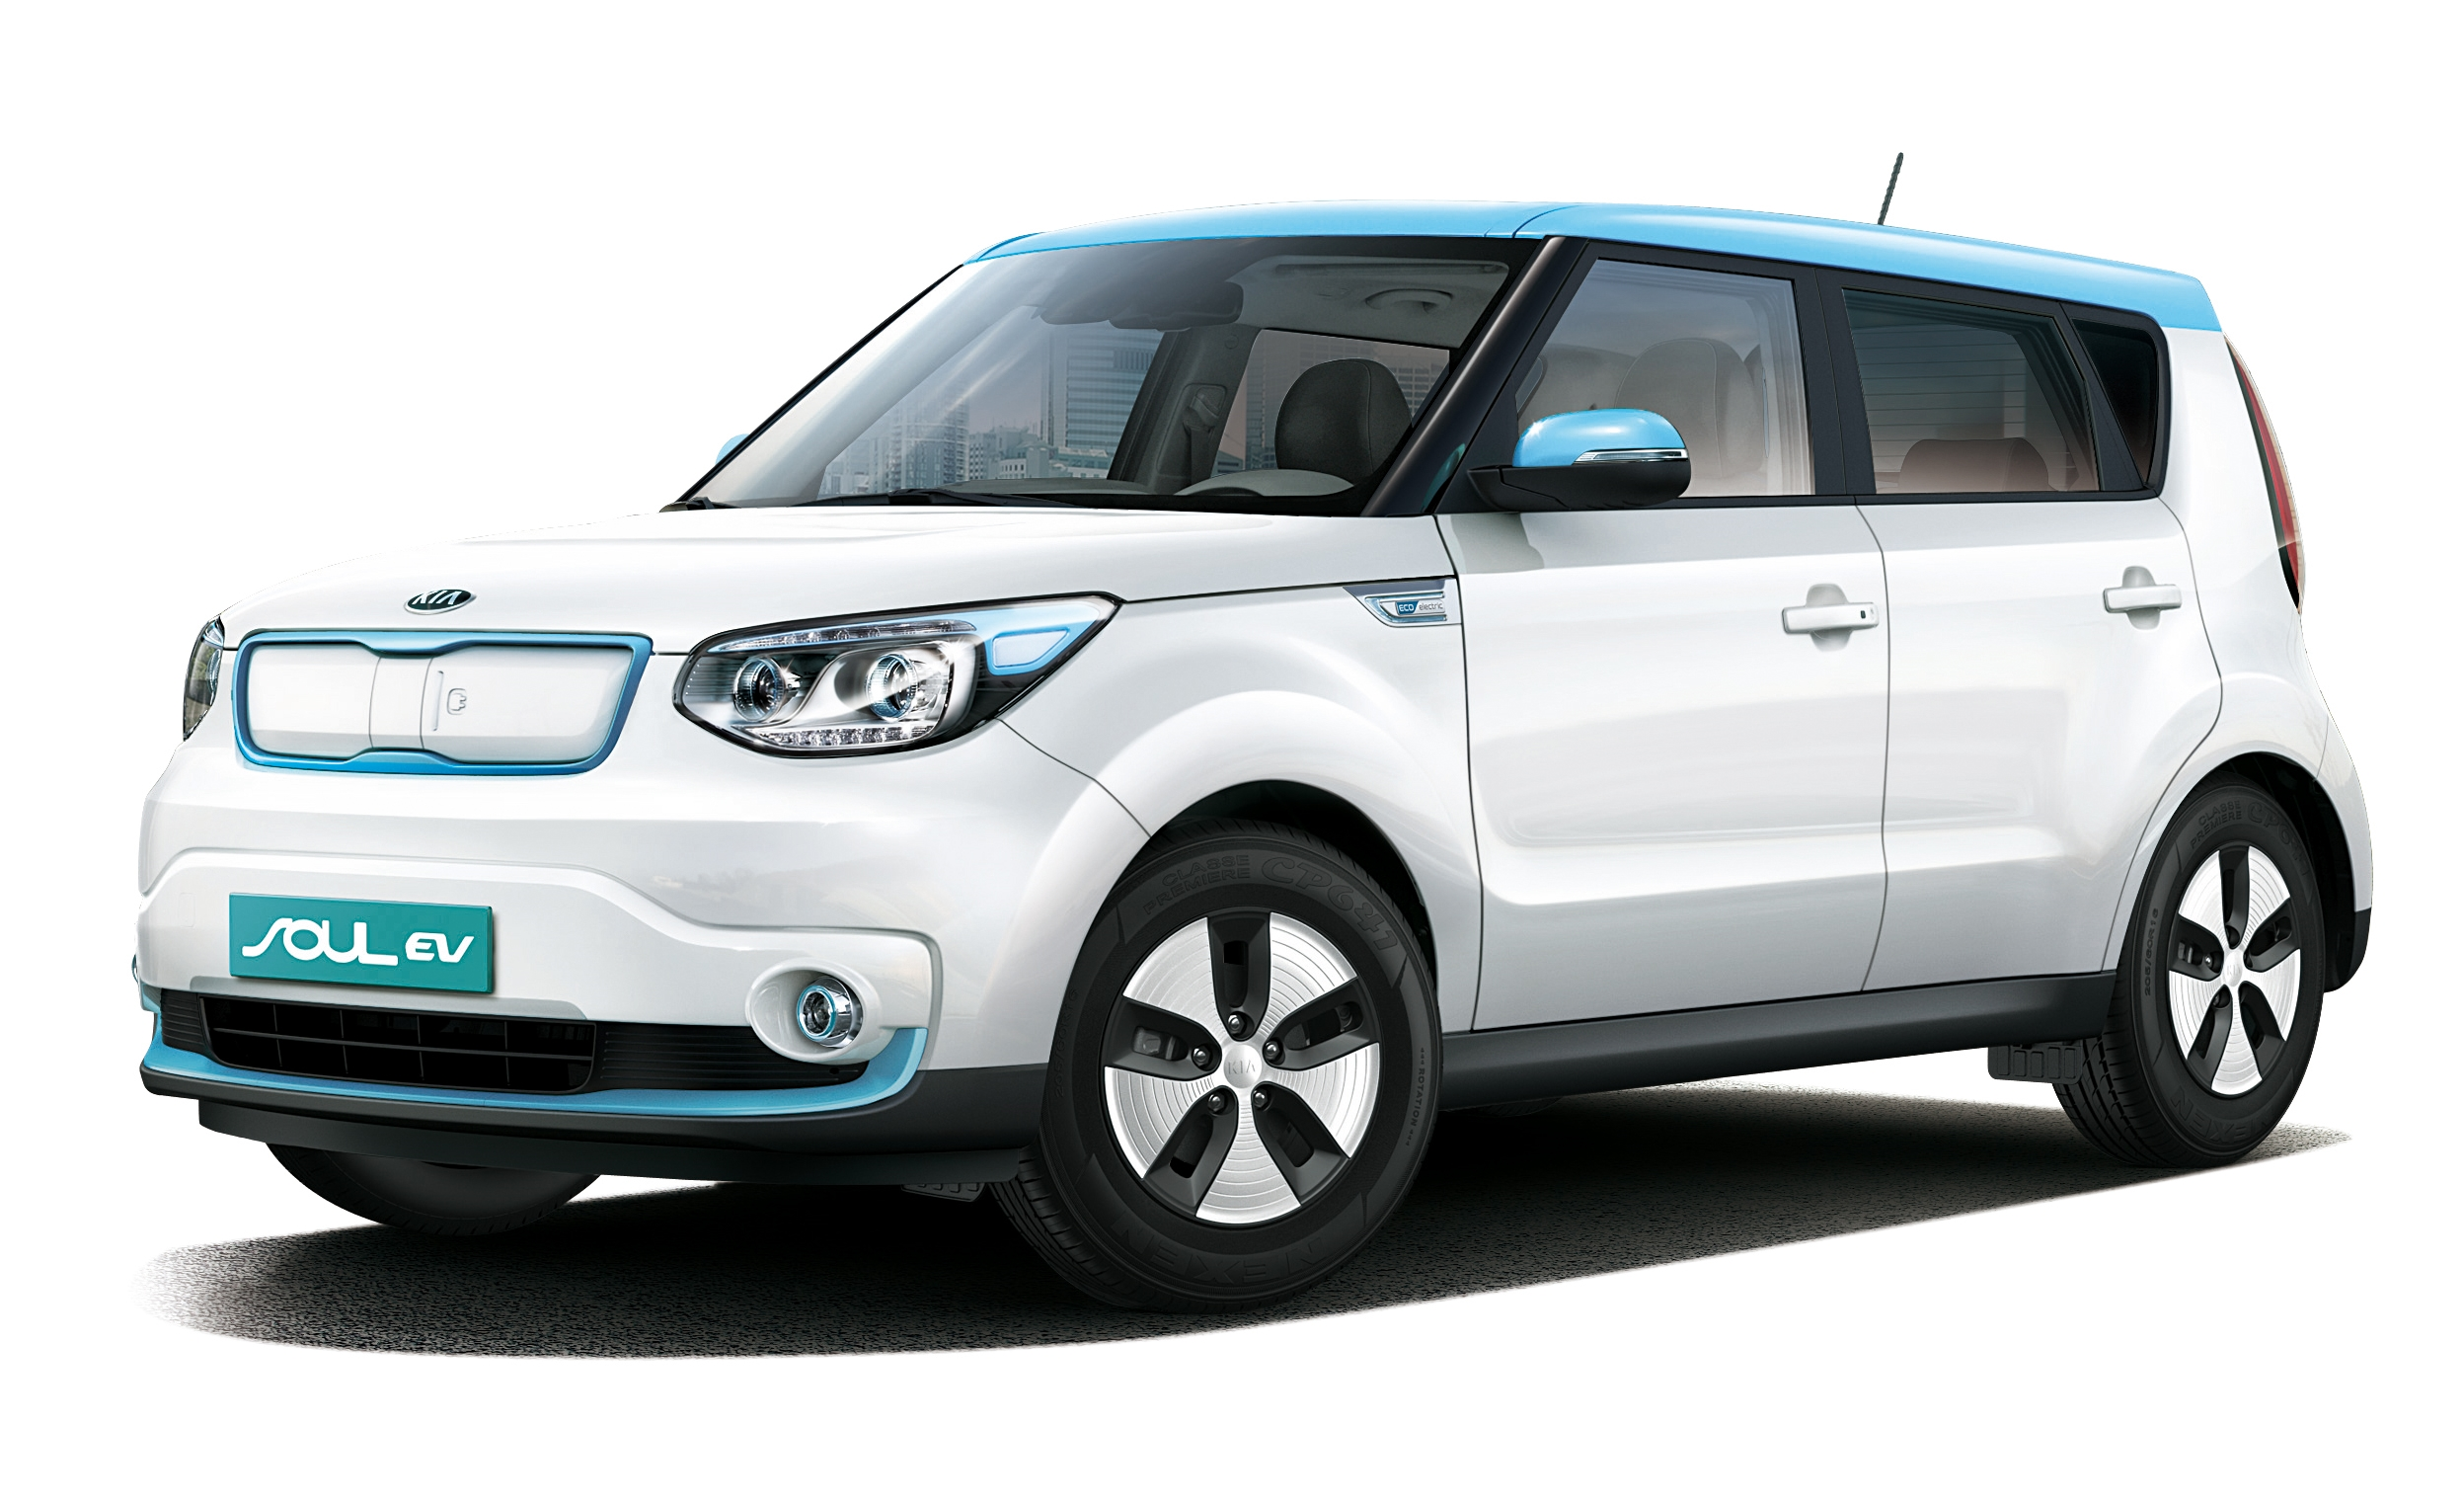 Hyundai Kia Motors Rank Third In Sales Of Electric Cars In World Businesskorea